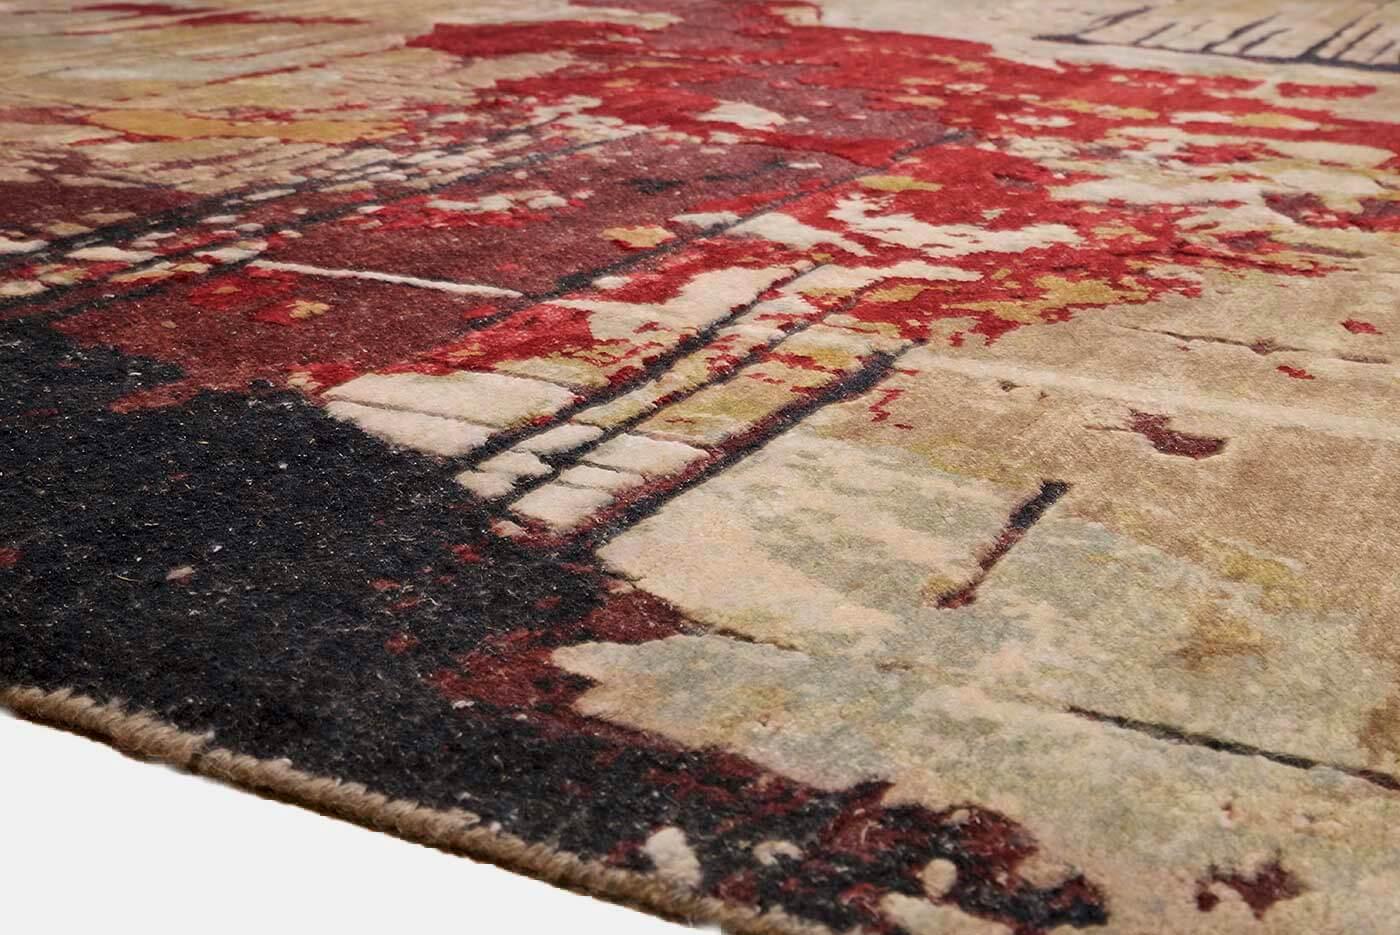 chelsea_design_oxidised_tapijt_moderne_tapijten_koreman_maastricht_310x241_multi-rand